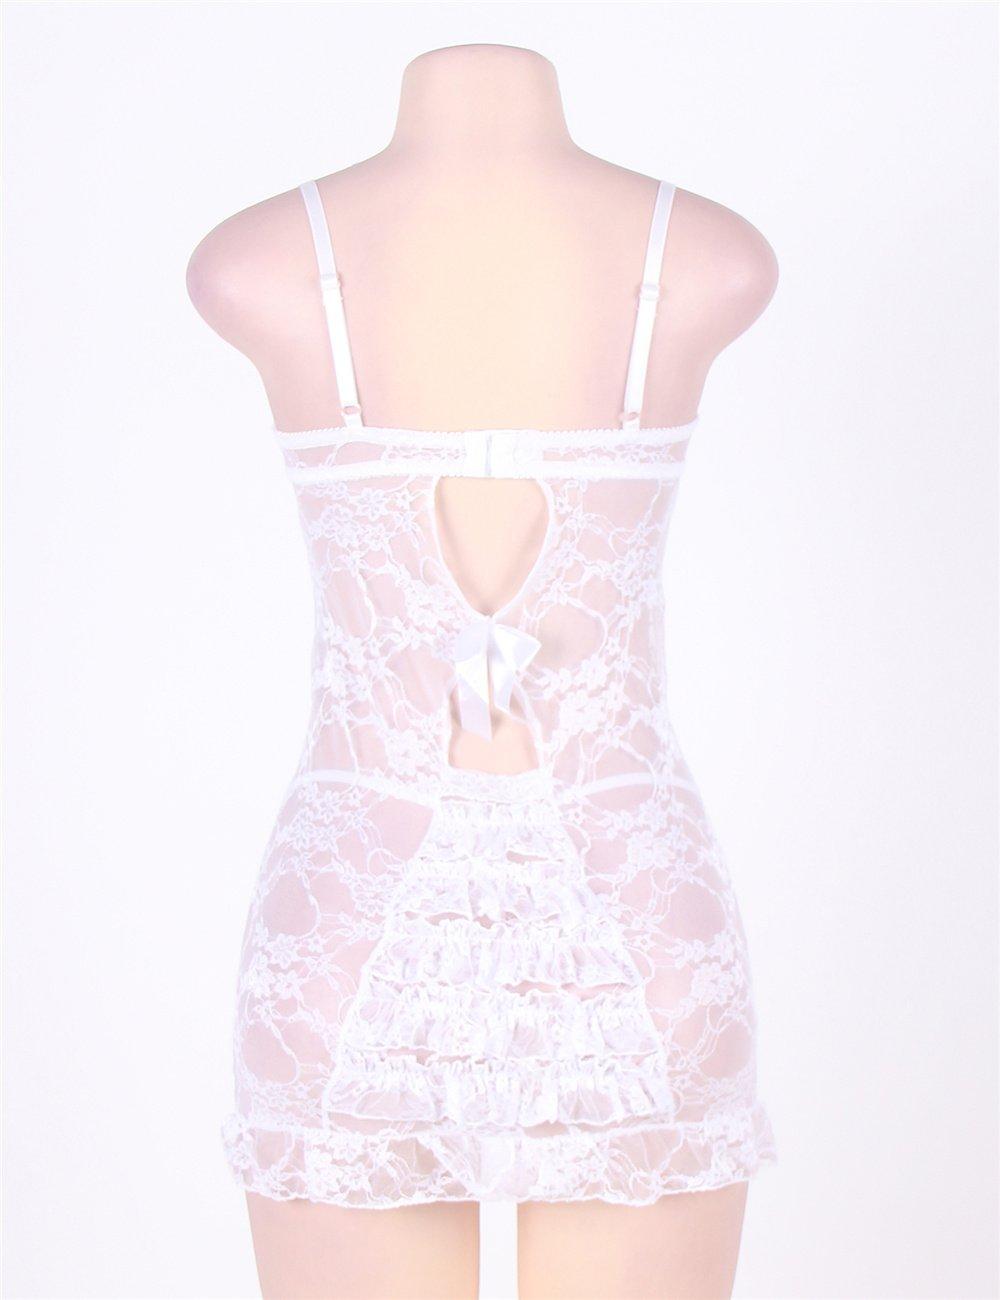 Sling Pijamas Lencería Erótica Sexy Tentación Mujeres Transparente Tanga Seductora Correa Camisón Tanga Transparente Conjunto - Opciones de tamaño múltiple (Color : Red, Tamaño : 5XL) bcab2a